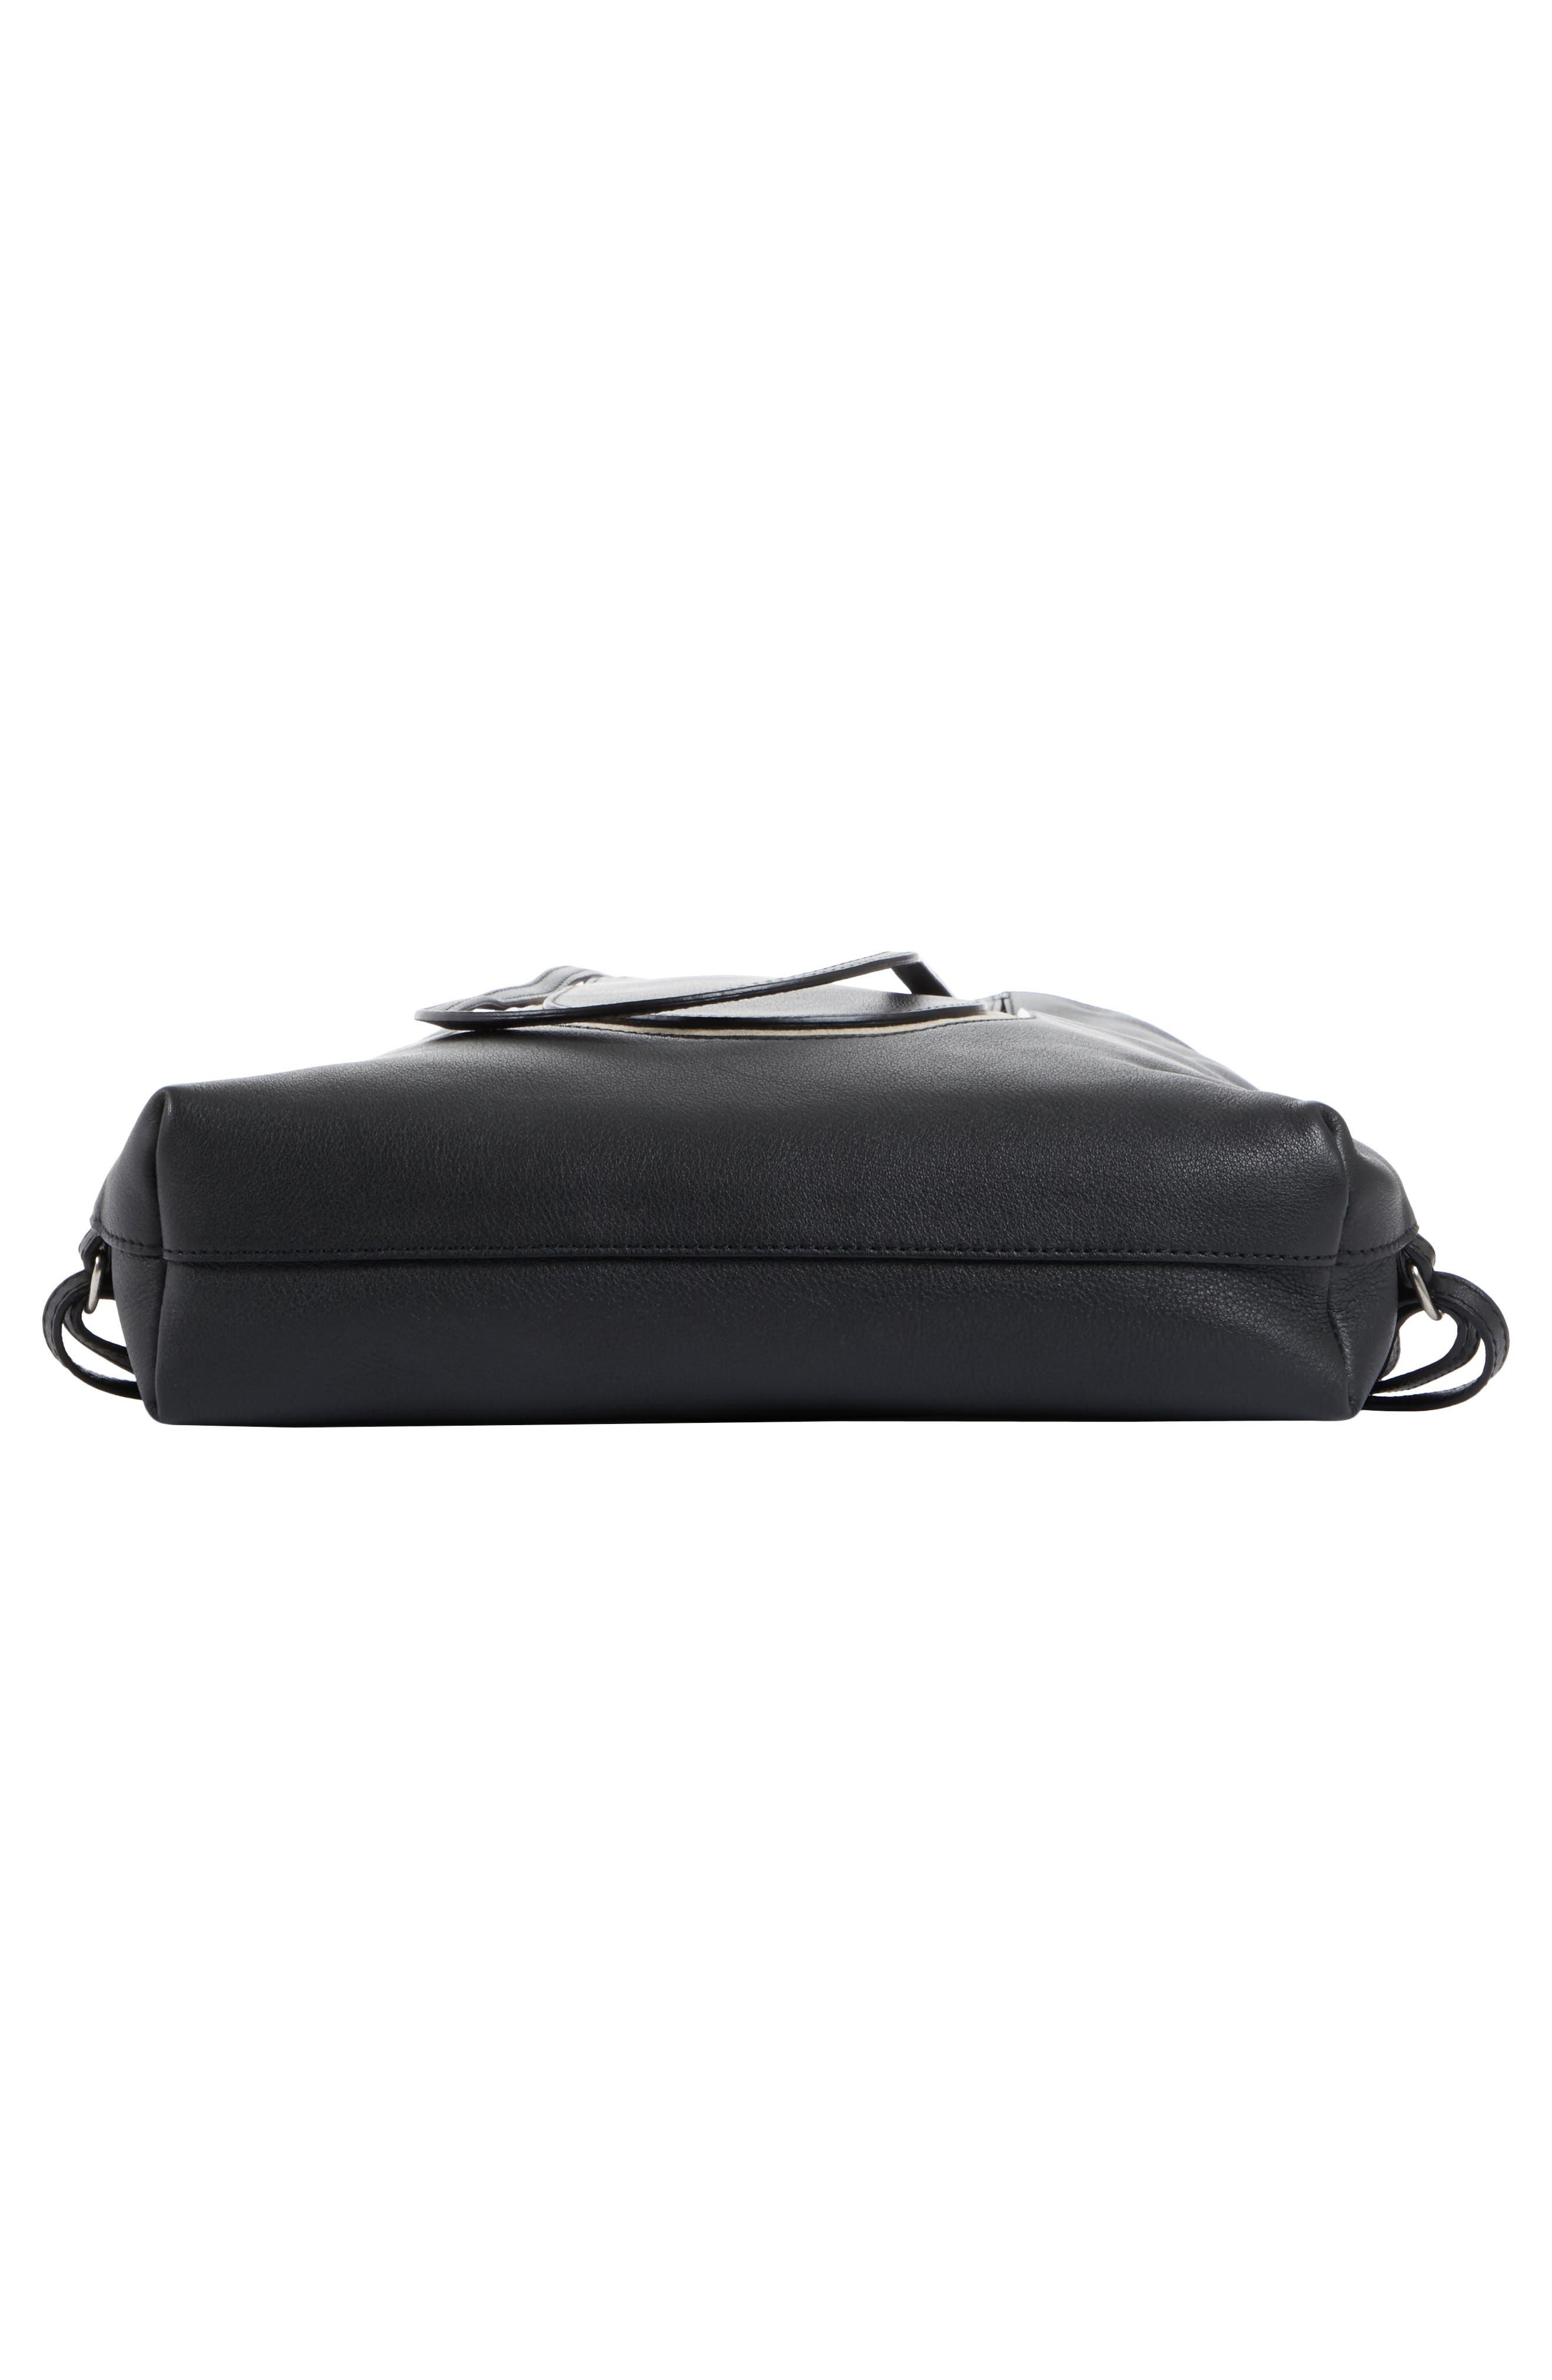 Calfskin Leather Backpack,                             Alternate thumbnail 6, color,                             001